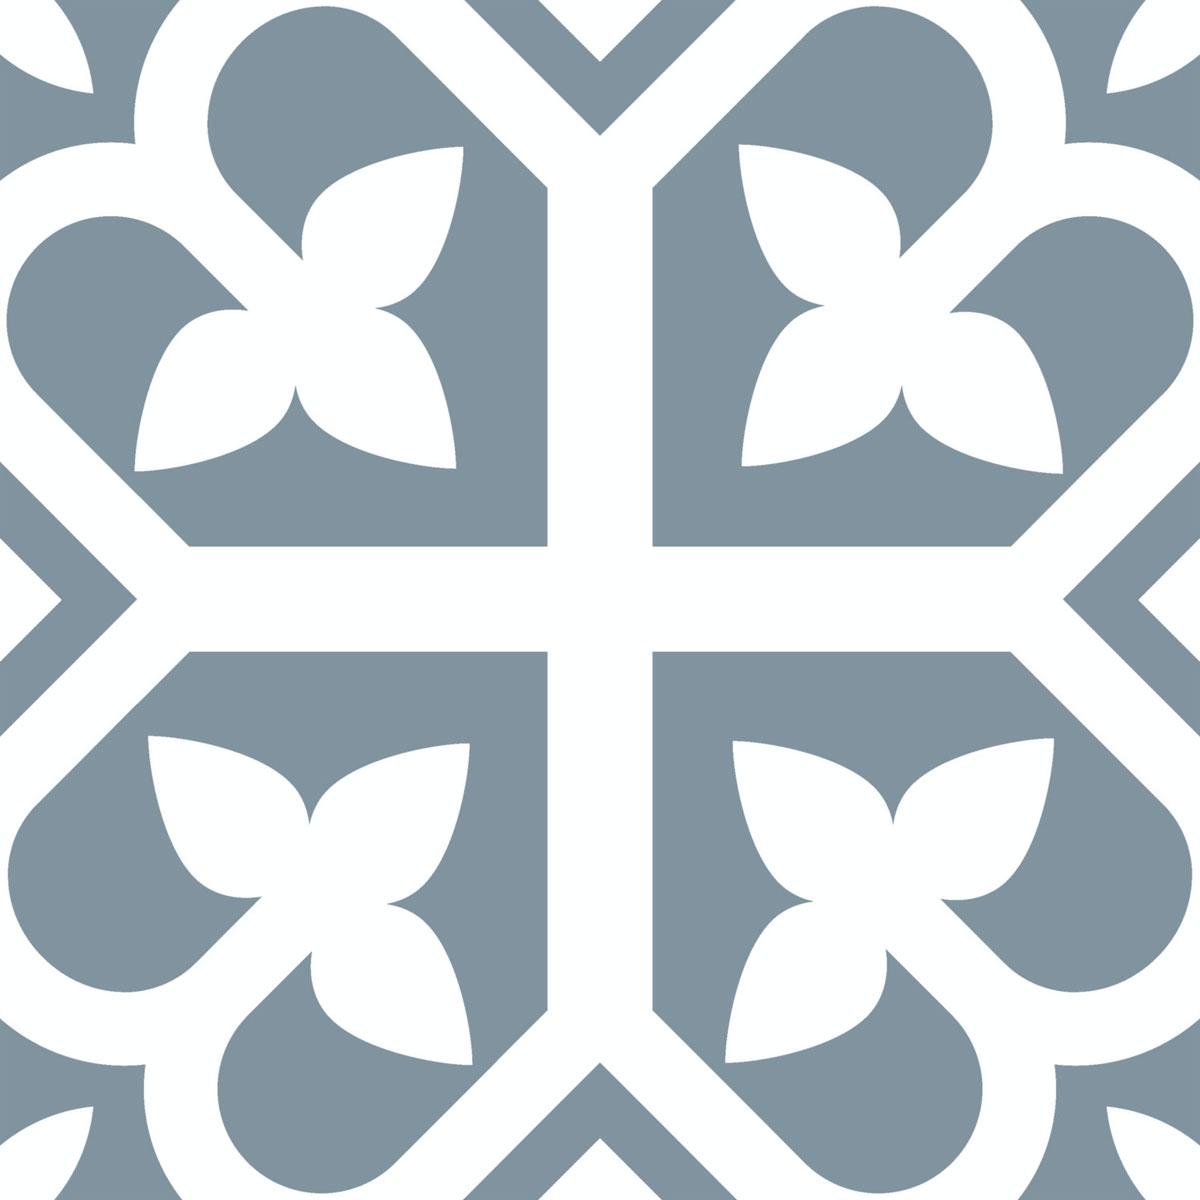 Picasso Evolution - Bloom Baby Blue - Patterned Tiles - Stone3 Brisbane